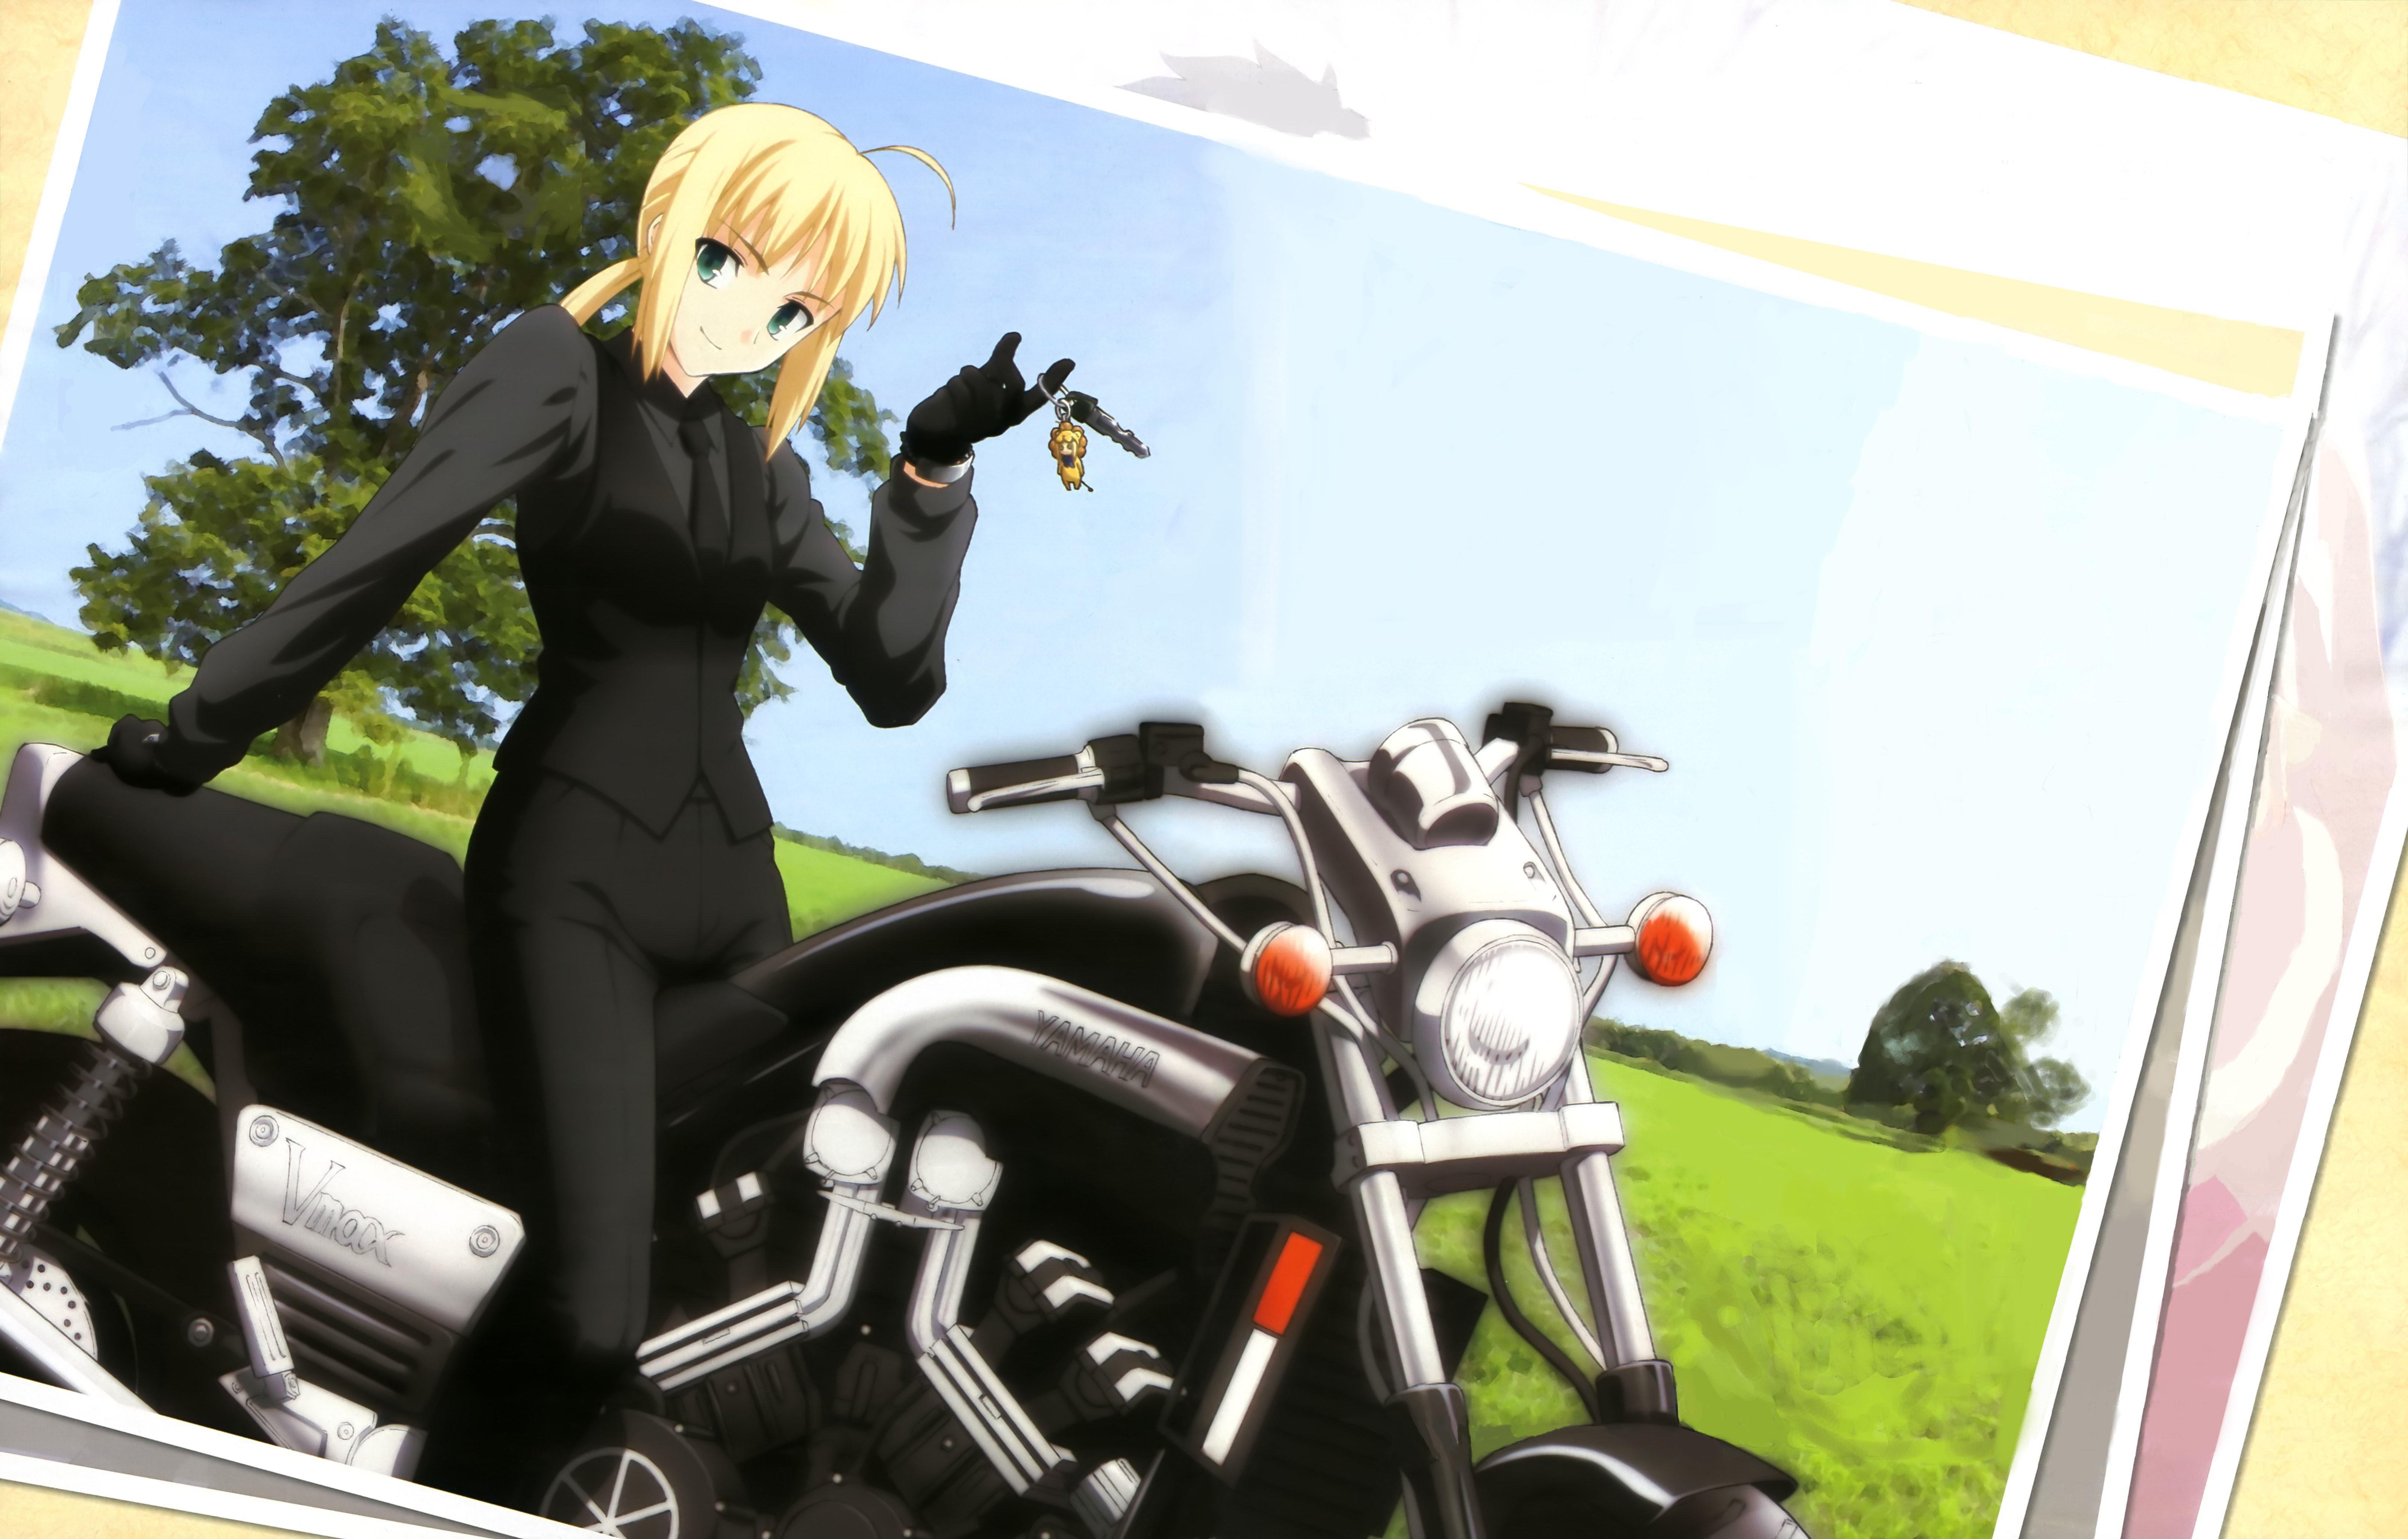 Pin by Mugiwara on Fate series Fate zero, Fate stay